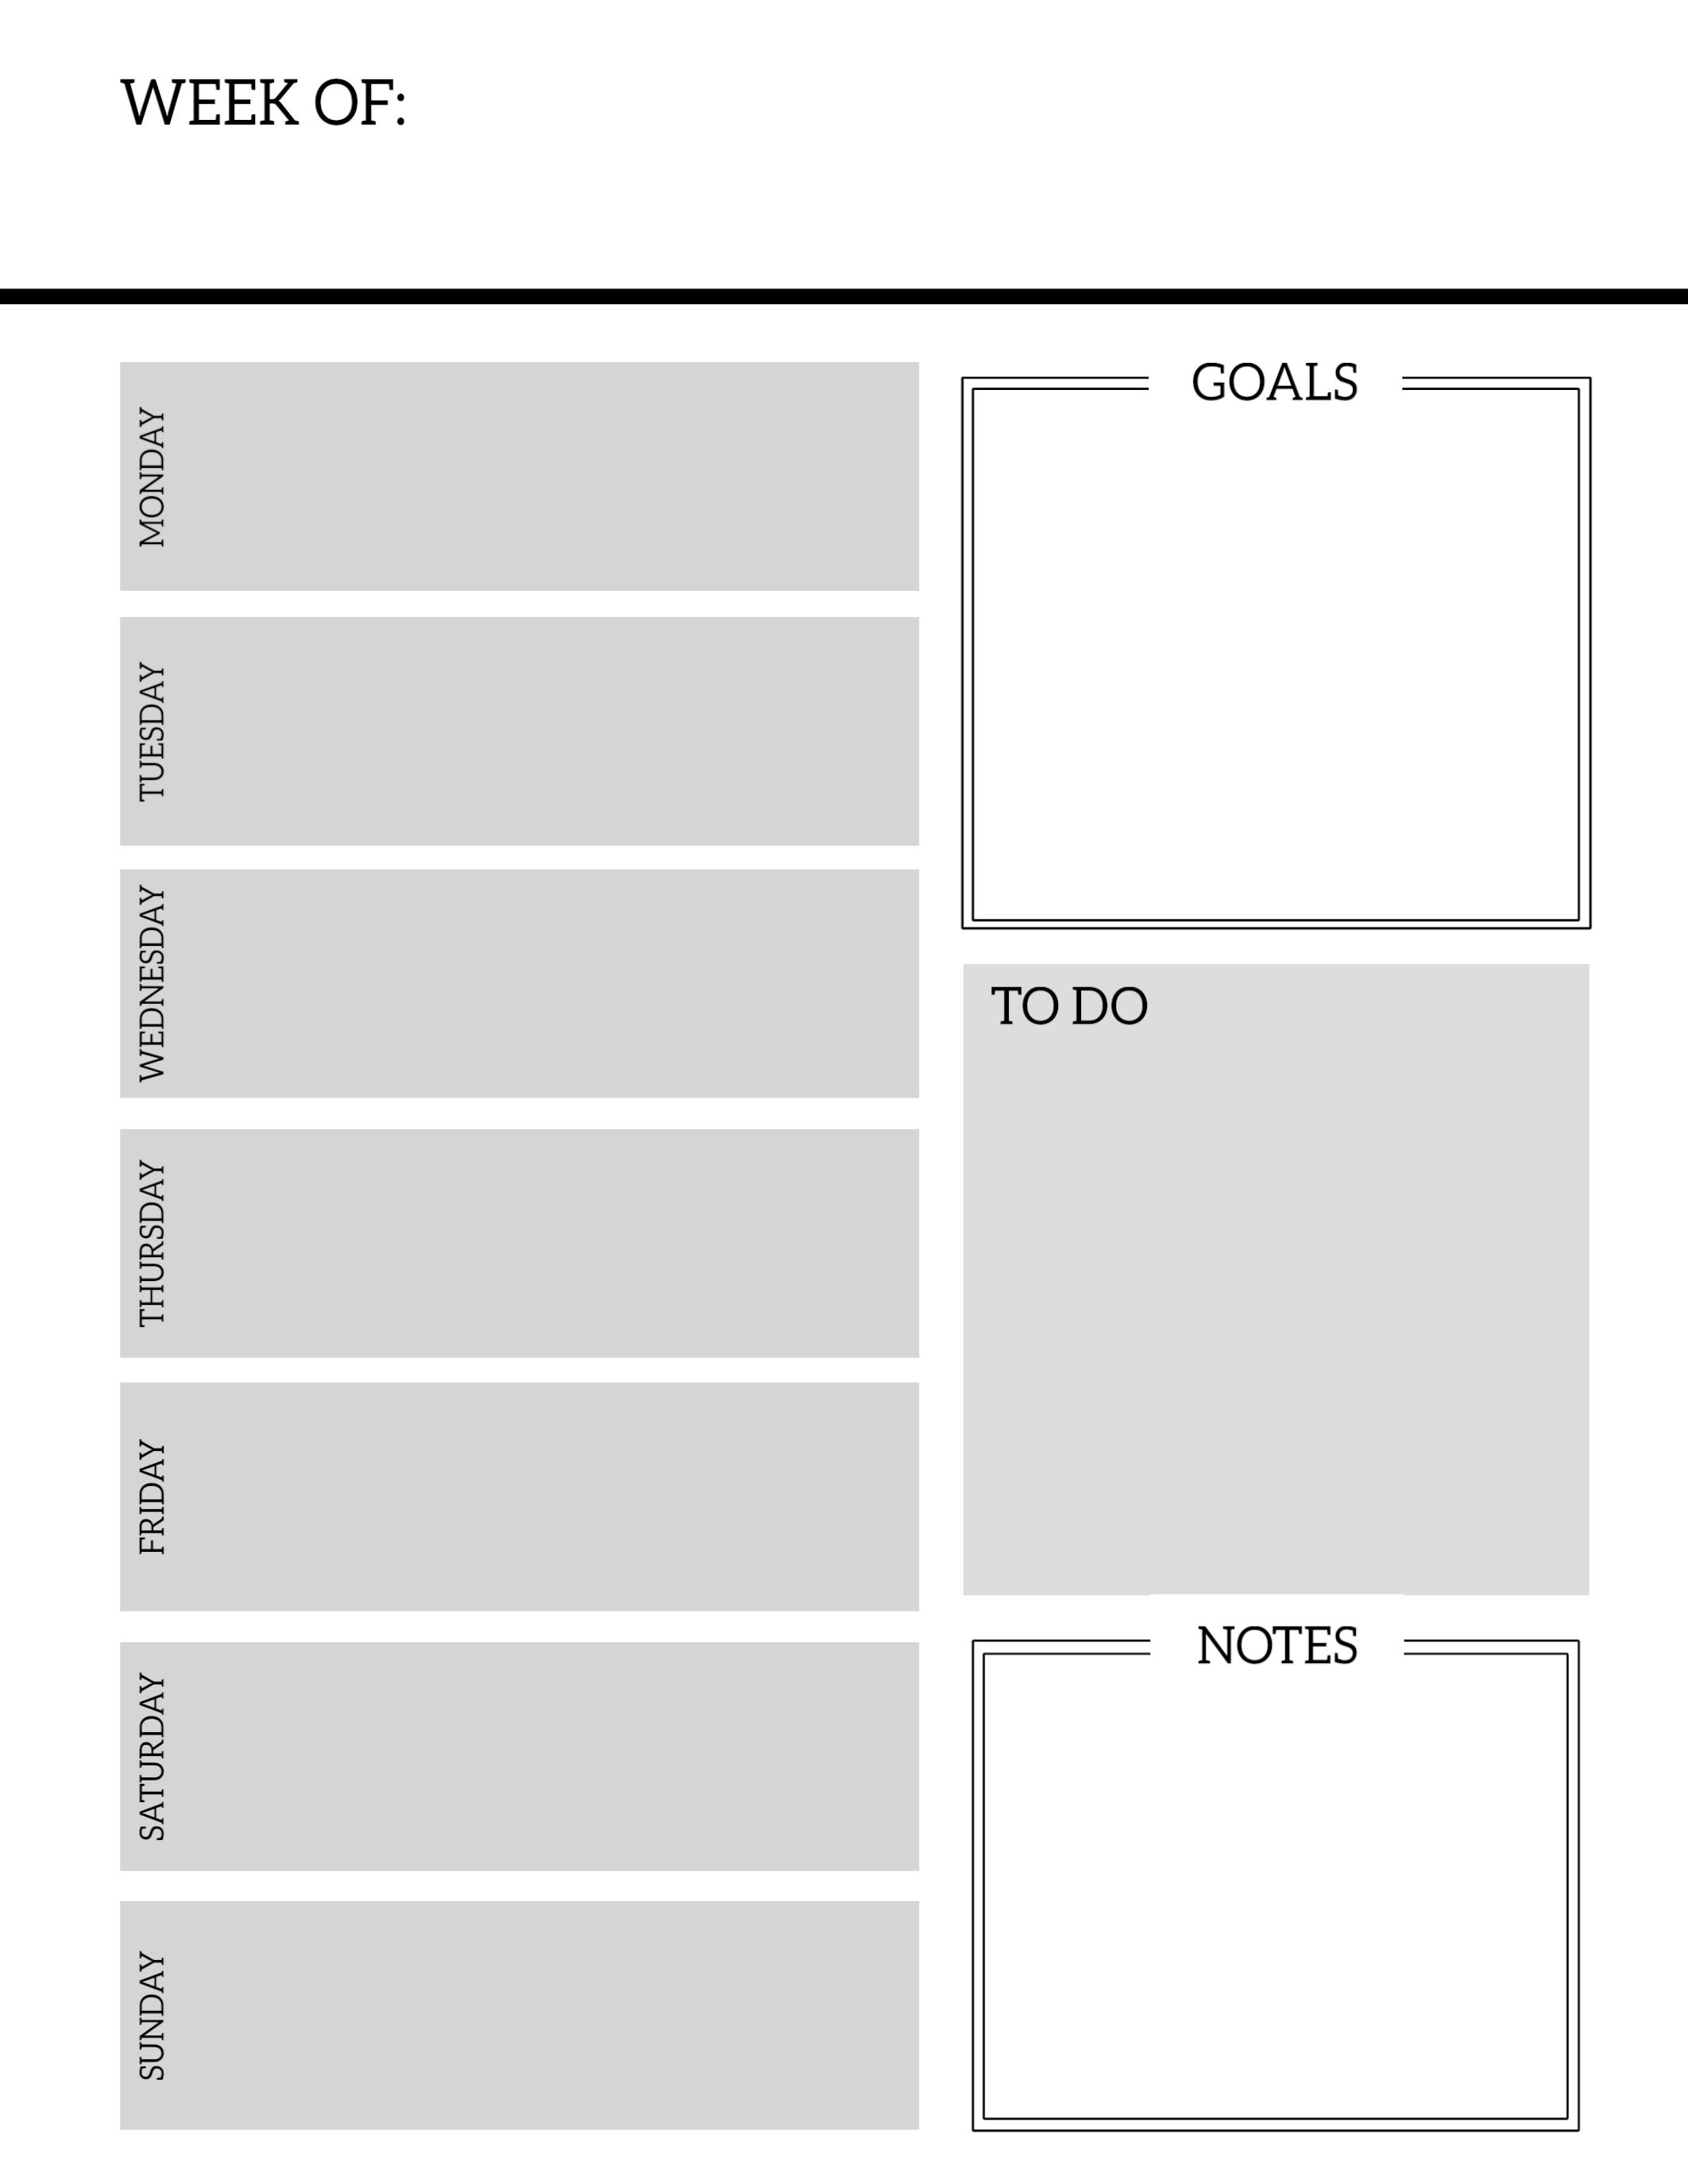 Free Printable Weekly Schedule Planner Pages Paper Trail Design Page - Free Printable Weekly Planner 2017